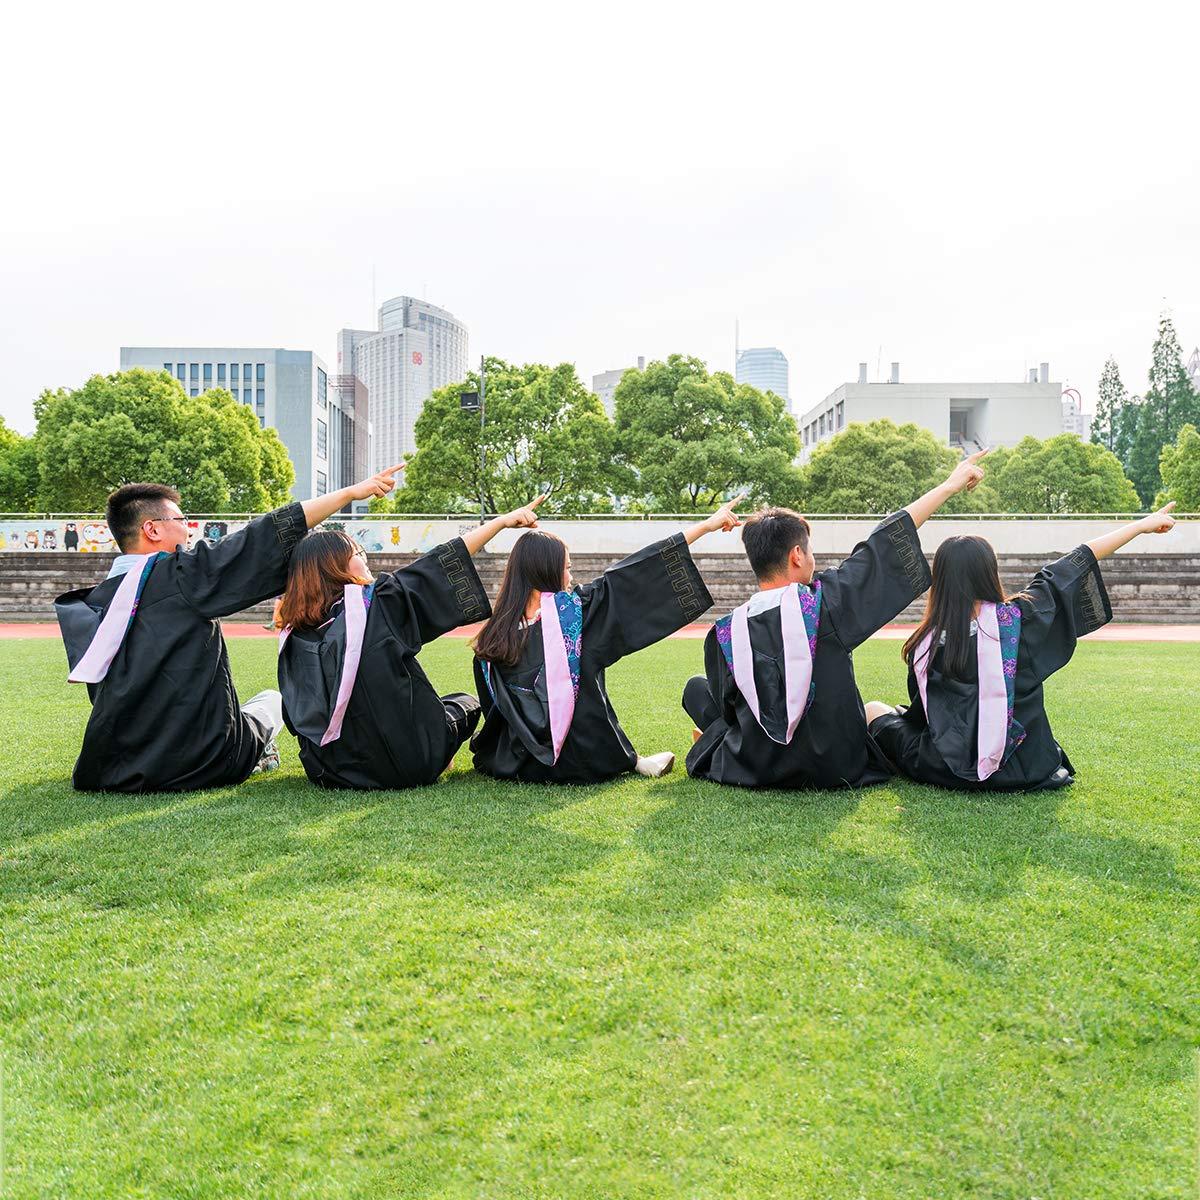 Amosfun Unisex Adult Graduation Gown Cap with Tassel Matte Graduats Costume Accessory for Bachelor Size S